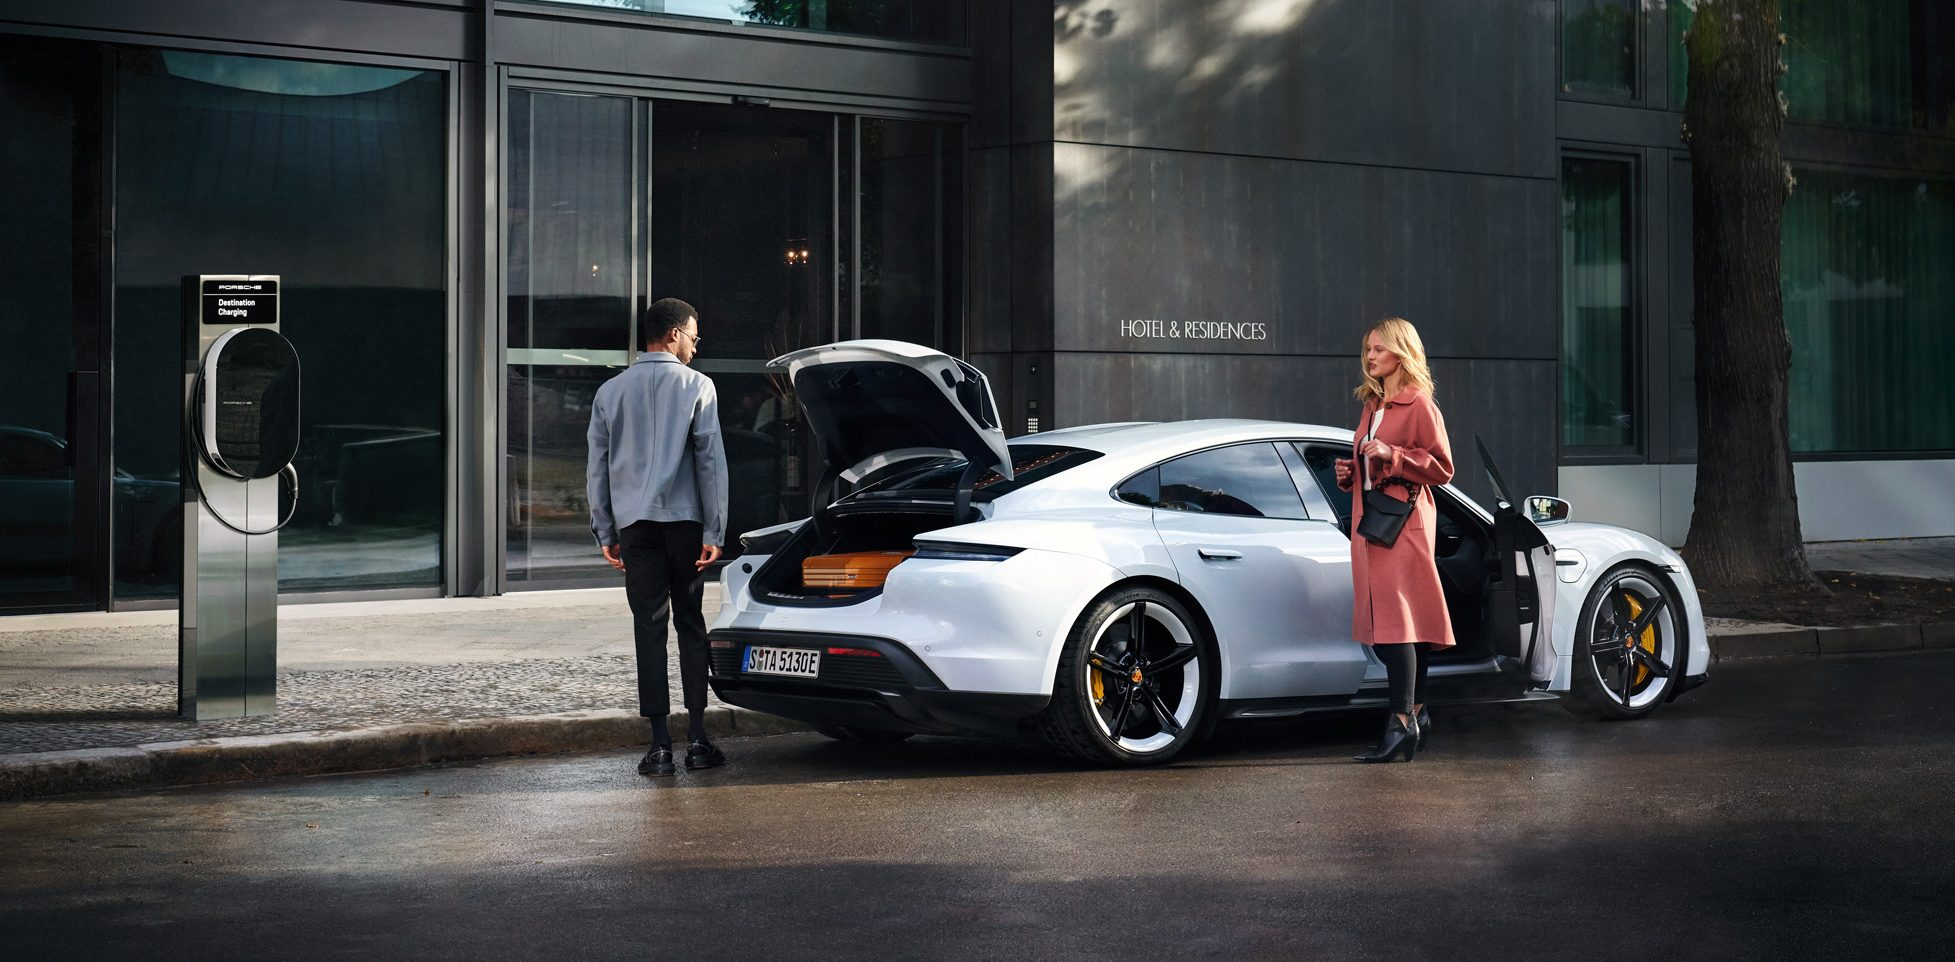 Porsche smartly copies Tesla's 'Destination Charging' model, already over 1,000 stations - Electrek